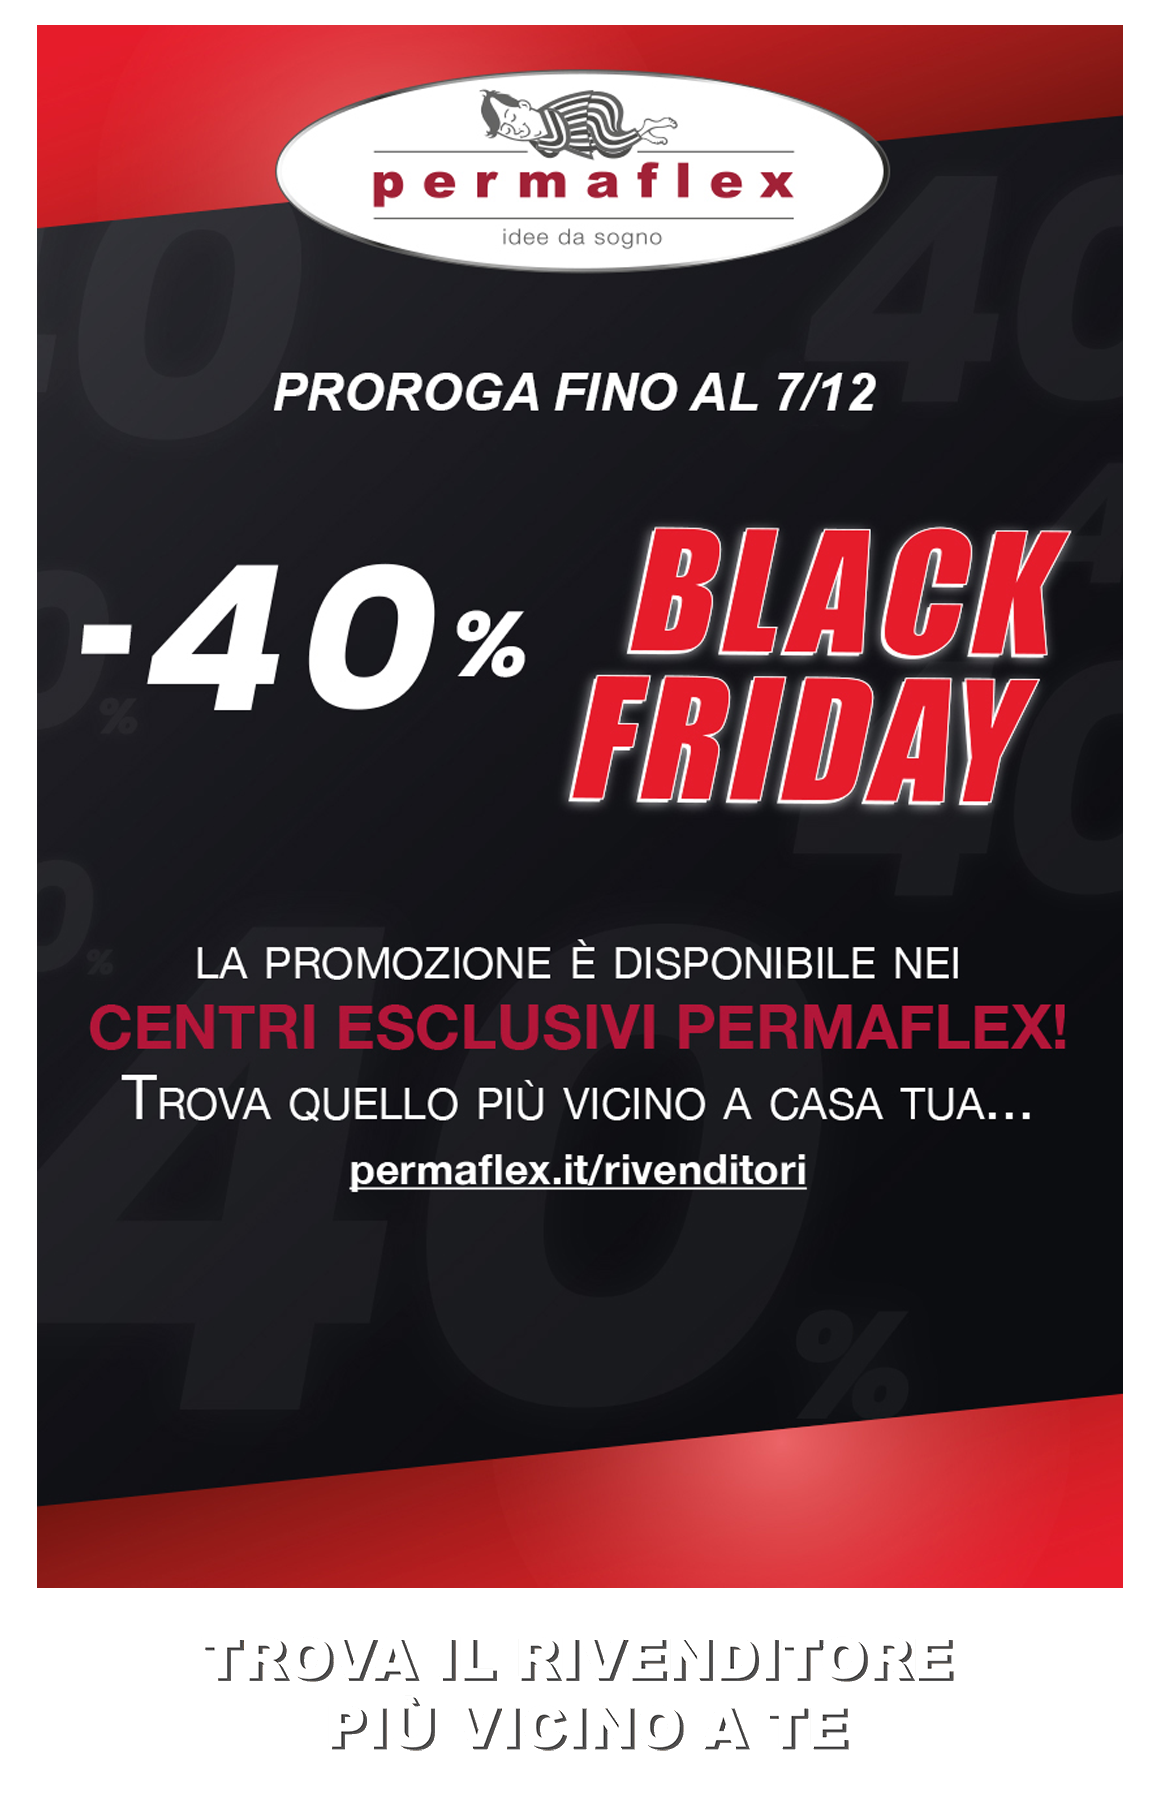 Permaflex Promo Black Friday 2019